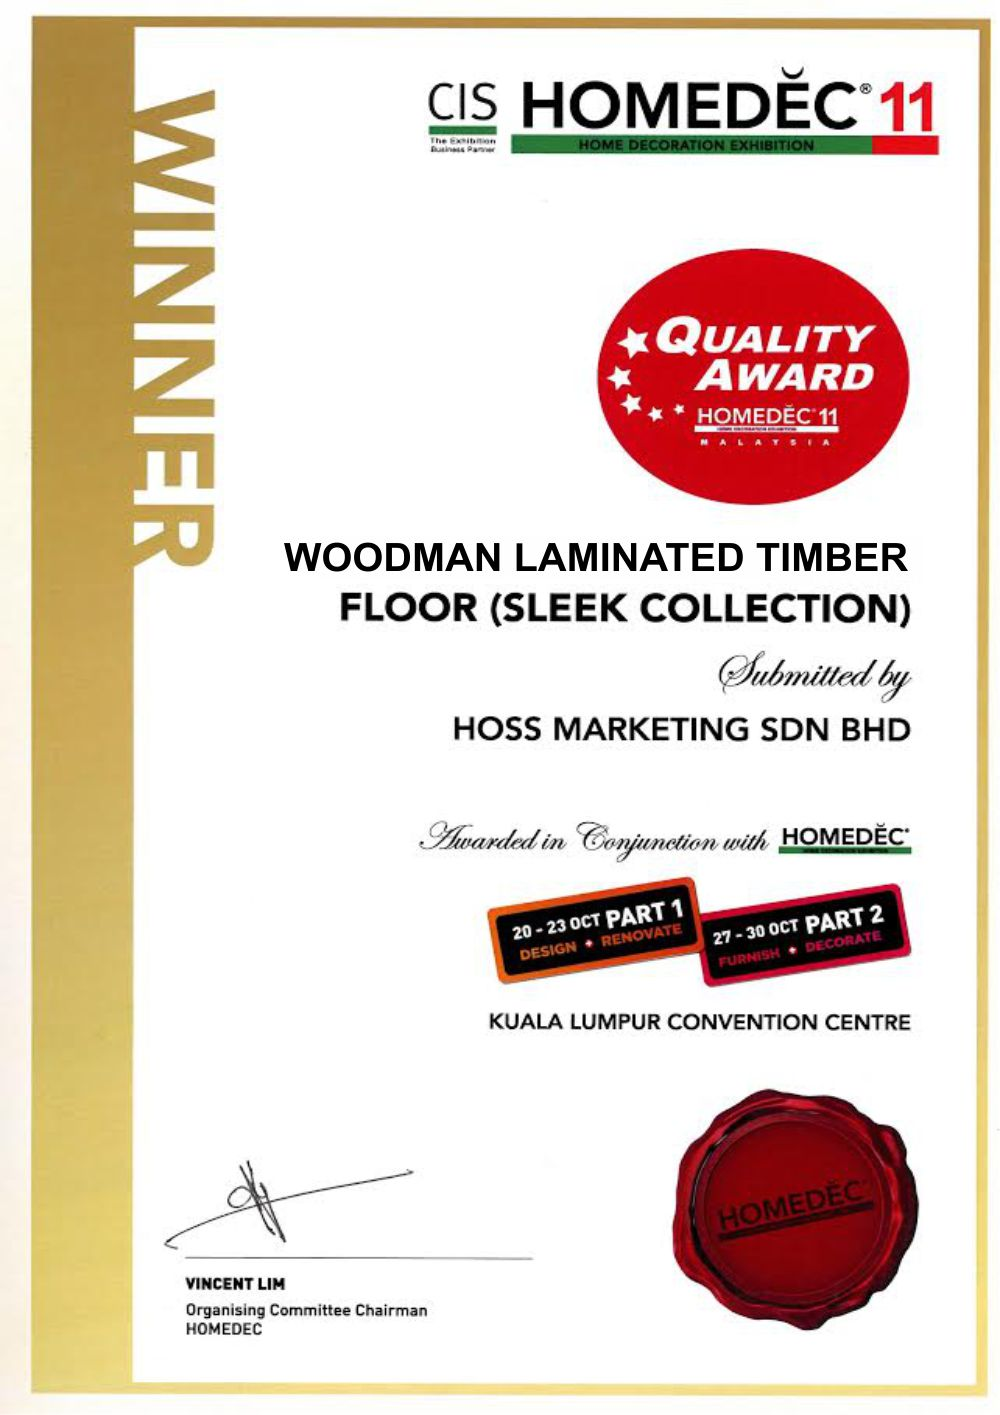 Homedec'11 Quality Award WOODMAN Laminated